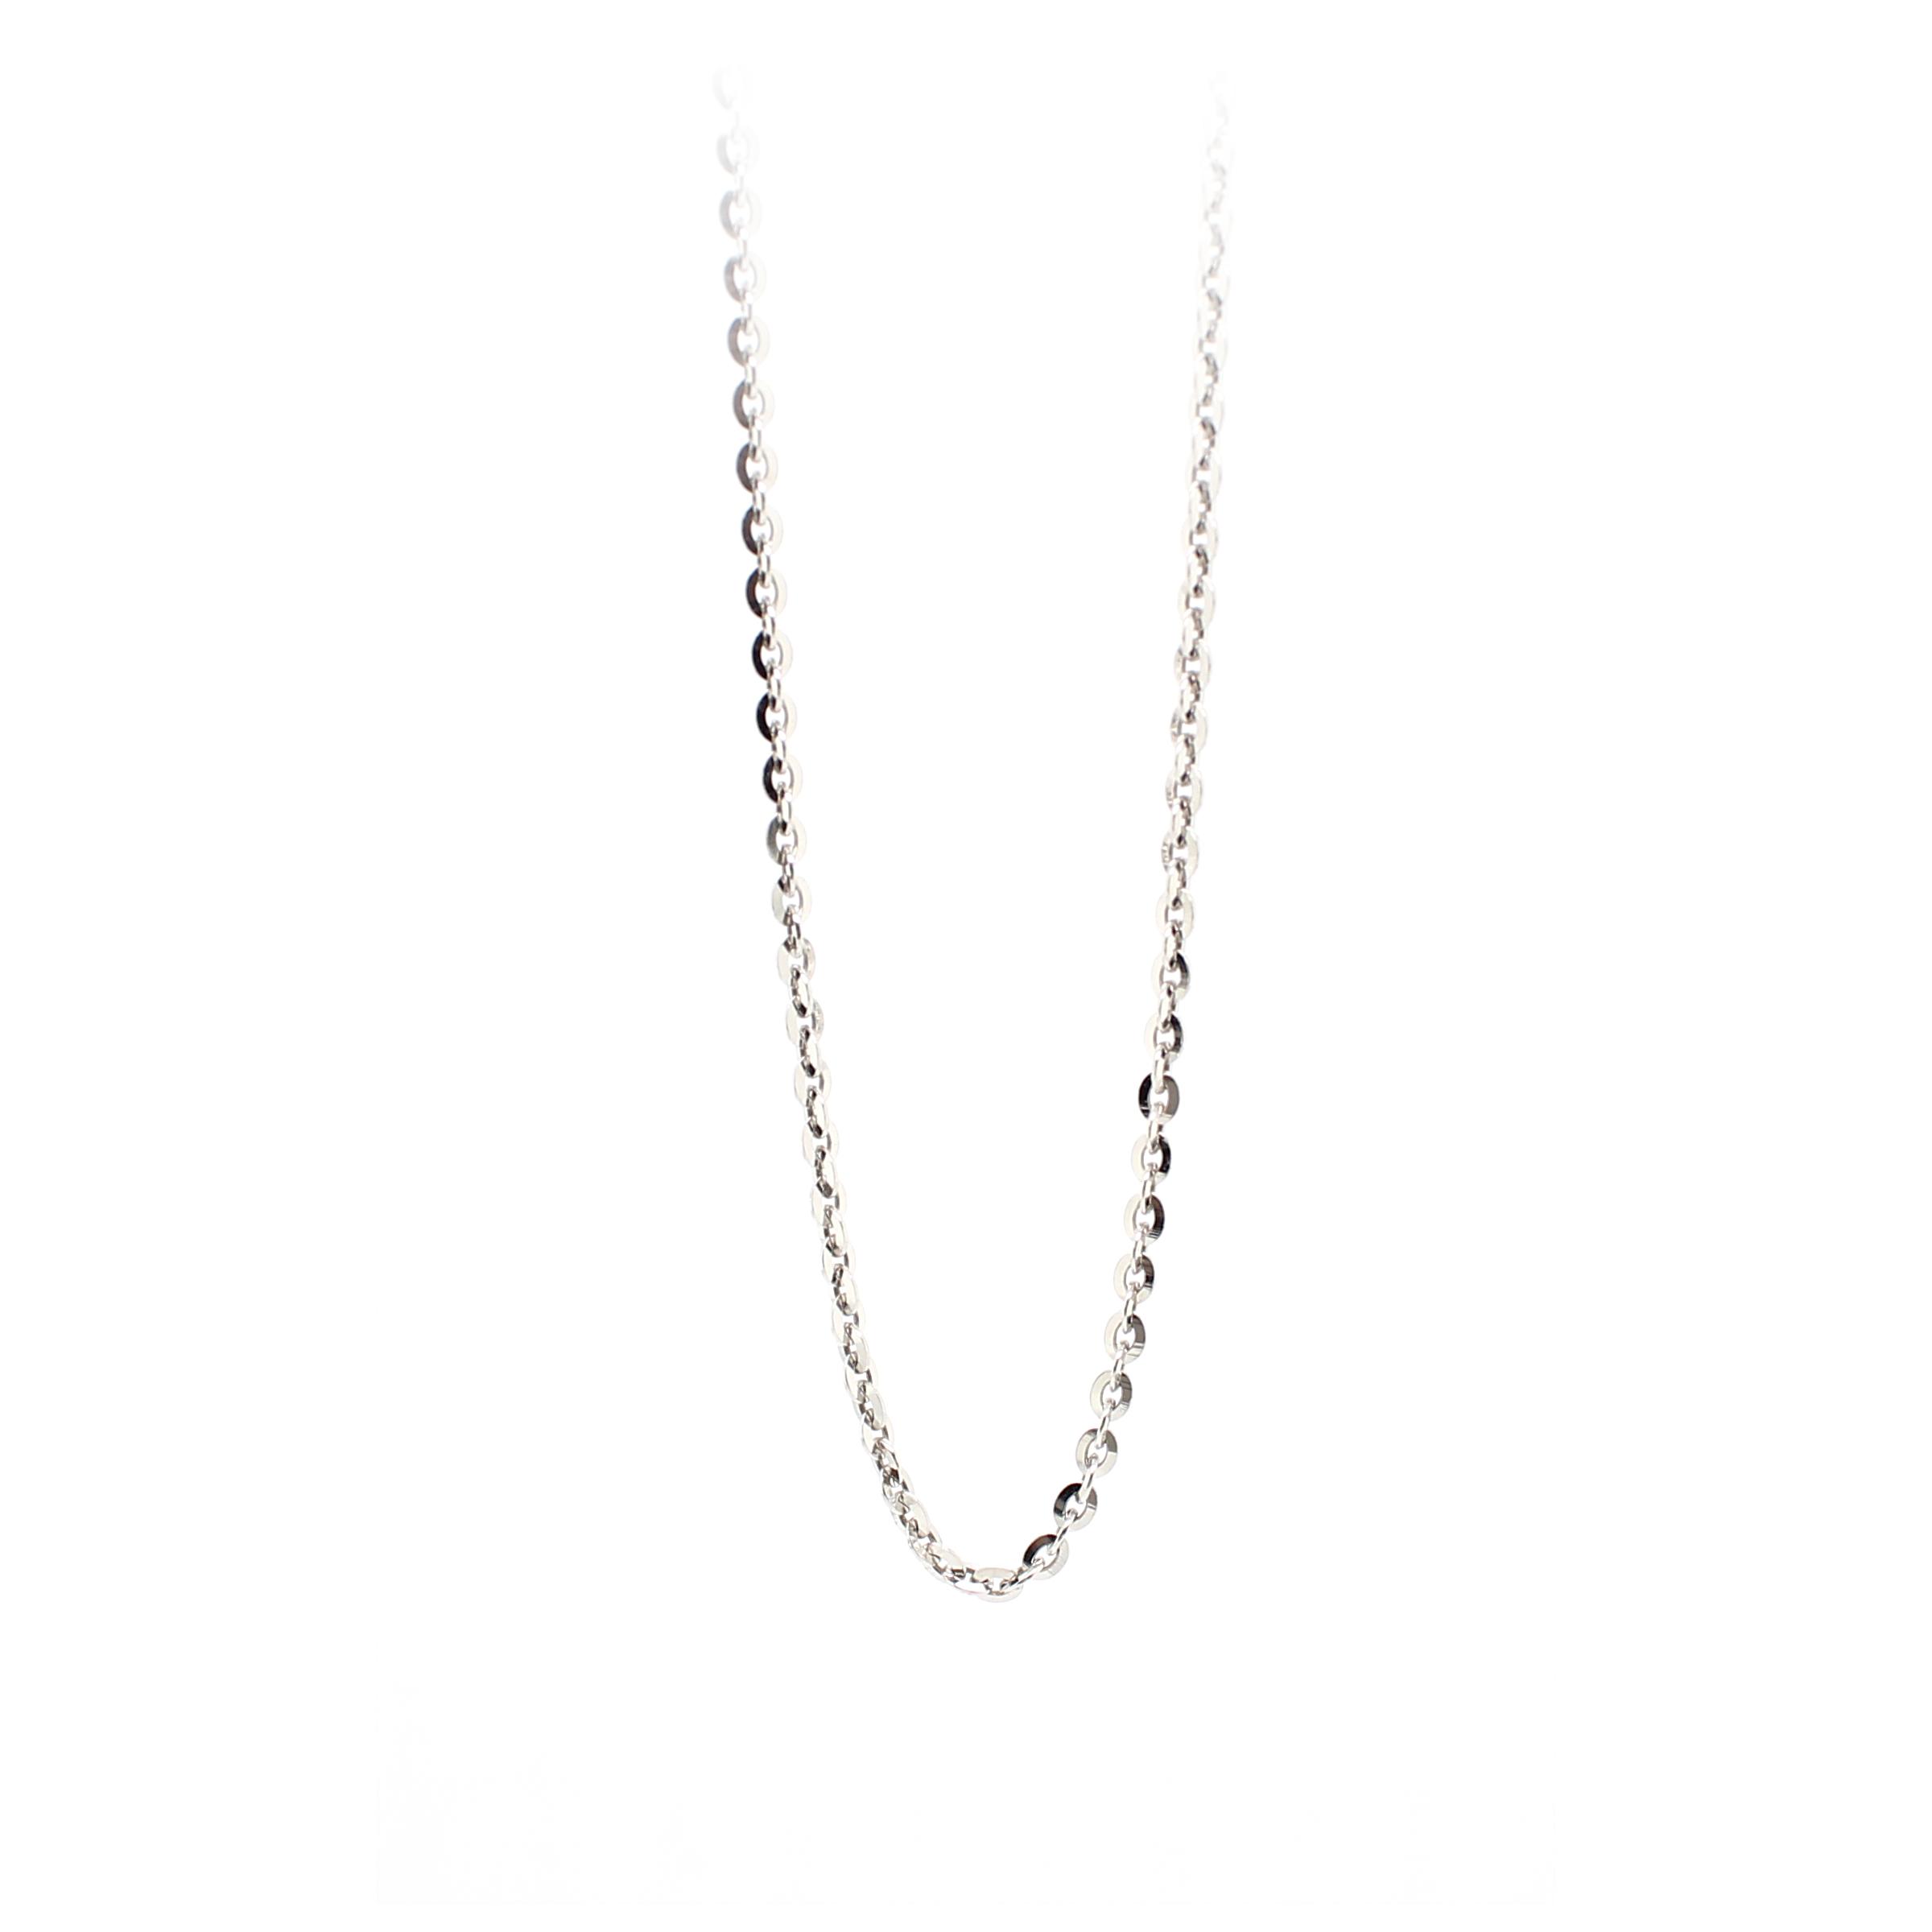 Royal Chain Sterling Silver 1.7mm Shiny Fancy Piatto Chain